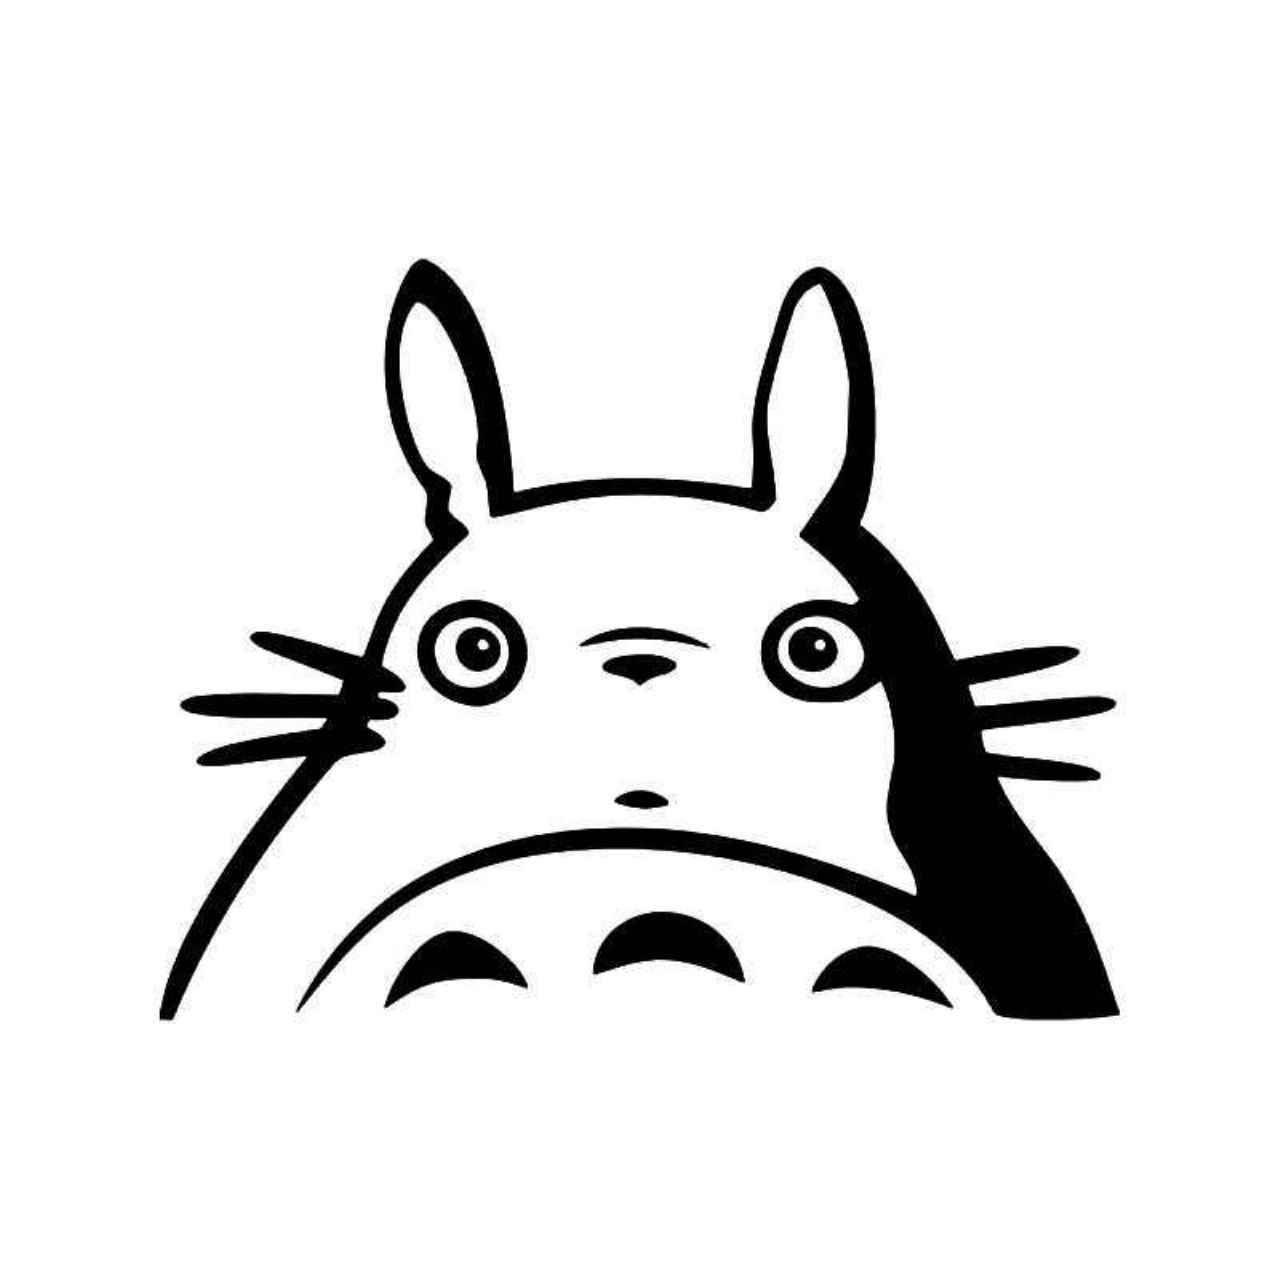 Totoro Anime 7 Vinyl Decal Sticker Ballzbeatz Com